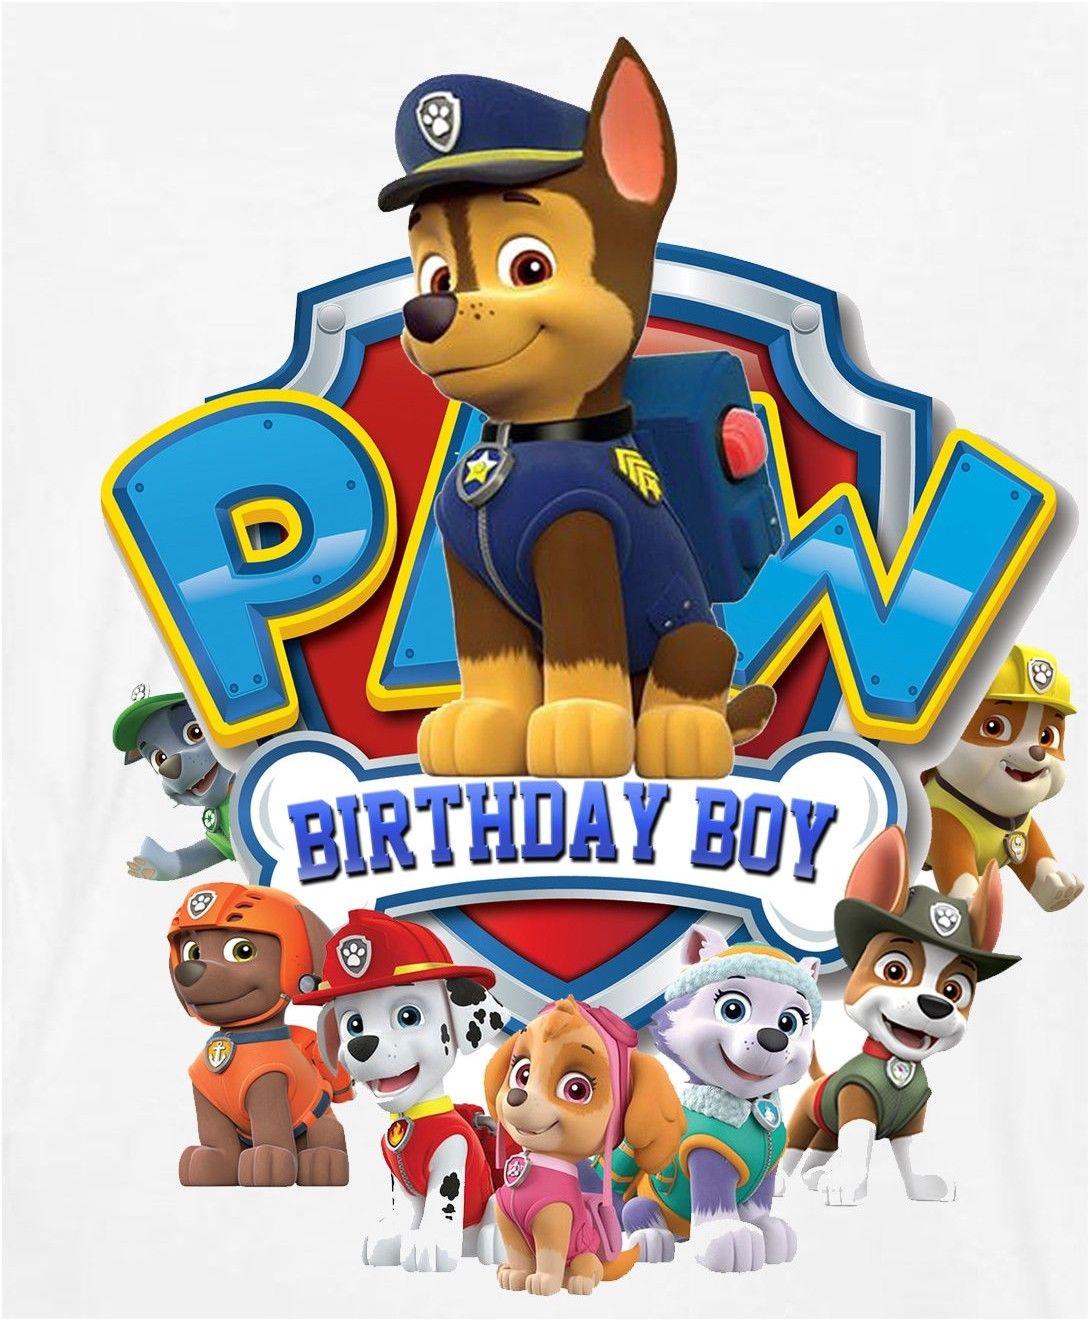 Birthday boy paw patrol clipart graphic library library $2.99 - ::::::::::::::Paw Patrol Birthday Boy:::::::::::::::::: T ... graphic library library